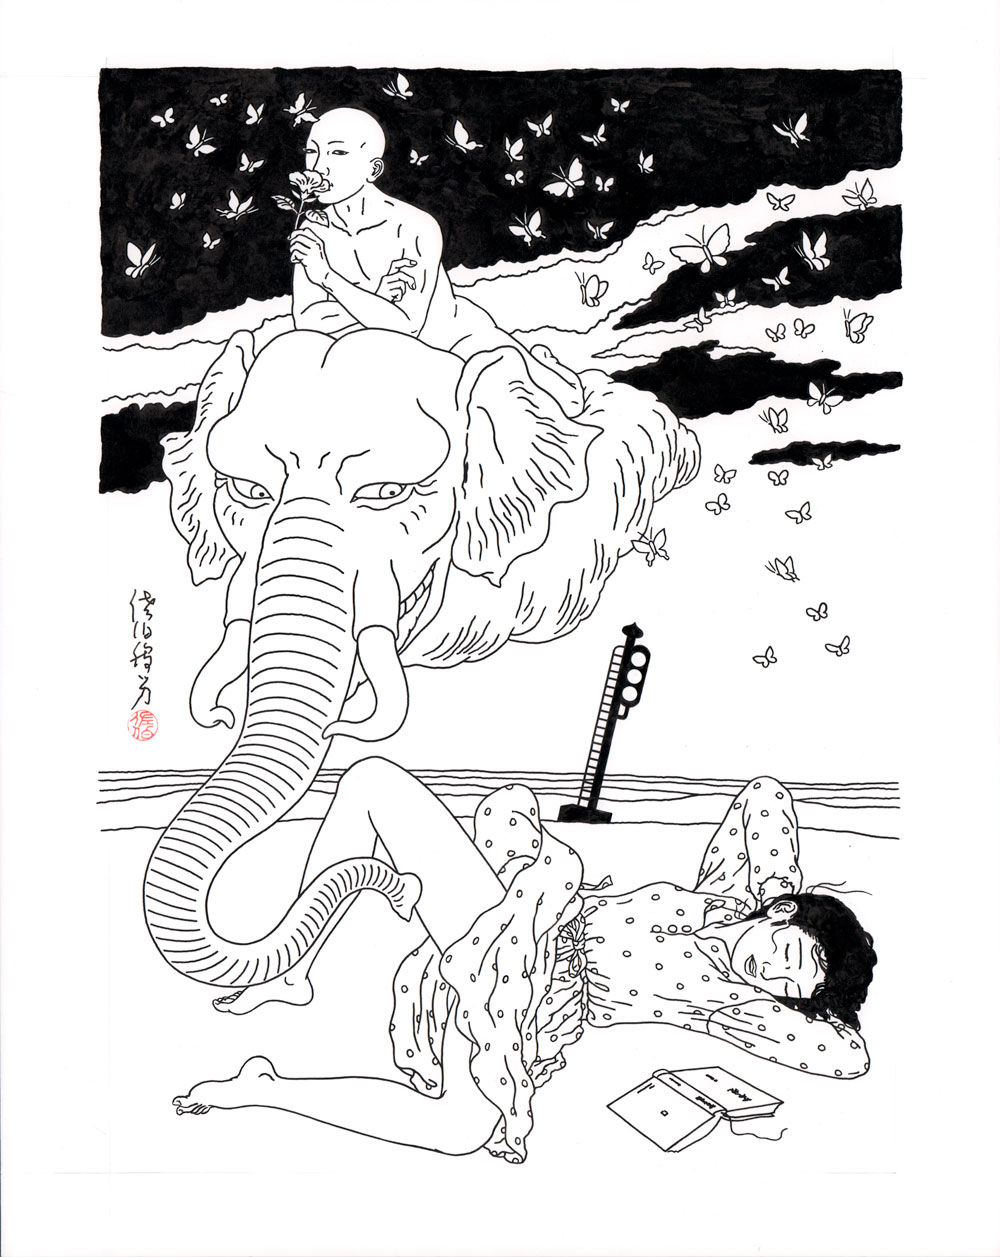 Toshio SaekiMadoromi, 2015Ink on paper.15 x 19.5 in. unframed